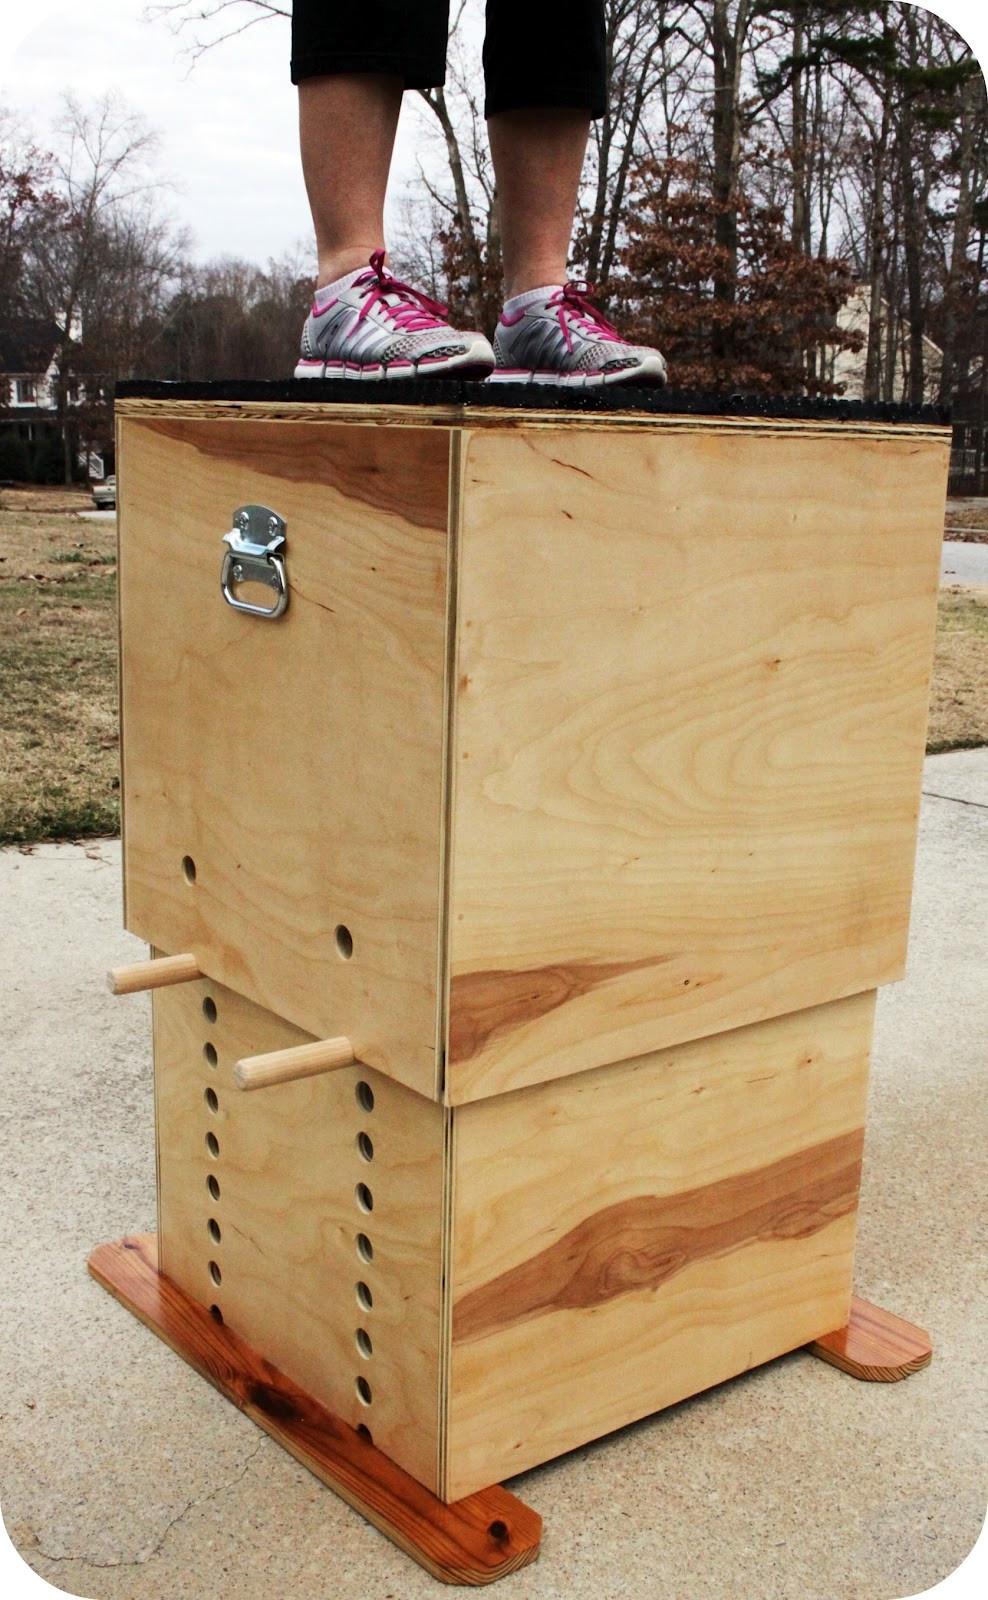 DIY Plyometric Box  TrendyToolbox ADJUSTABLE WOODEN PLYO BOX